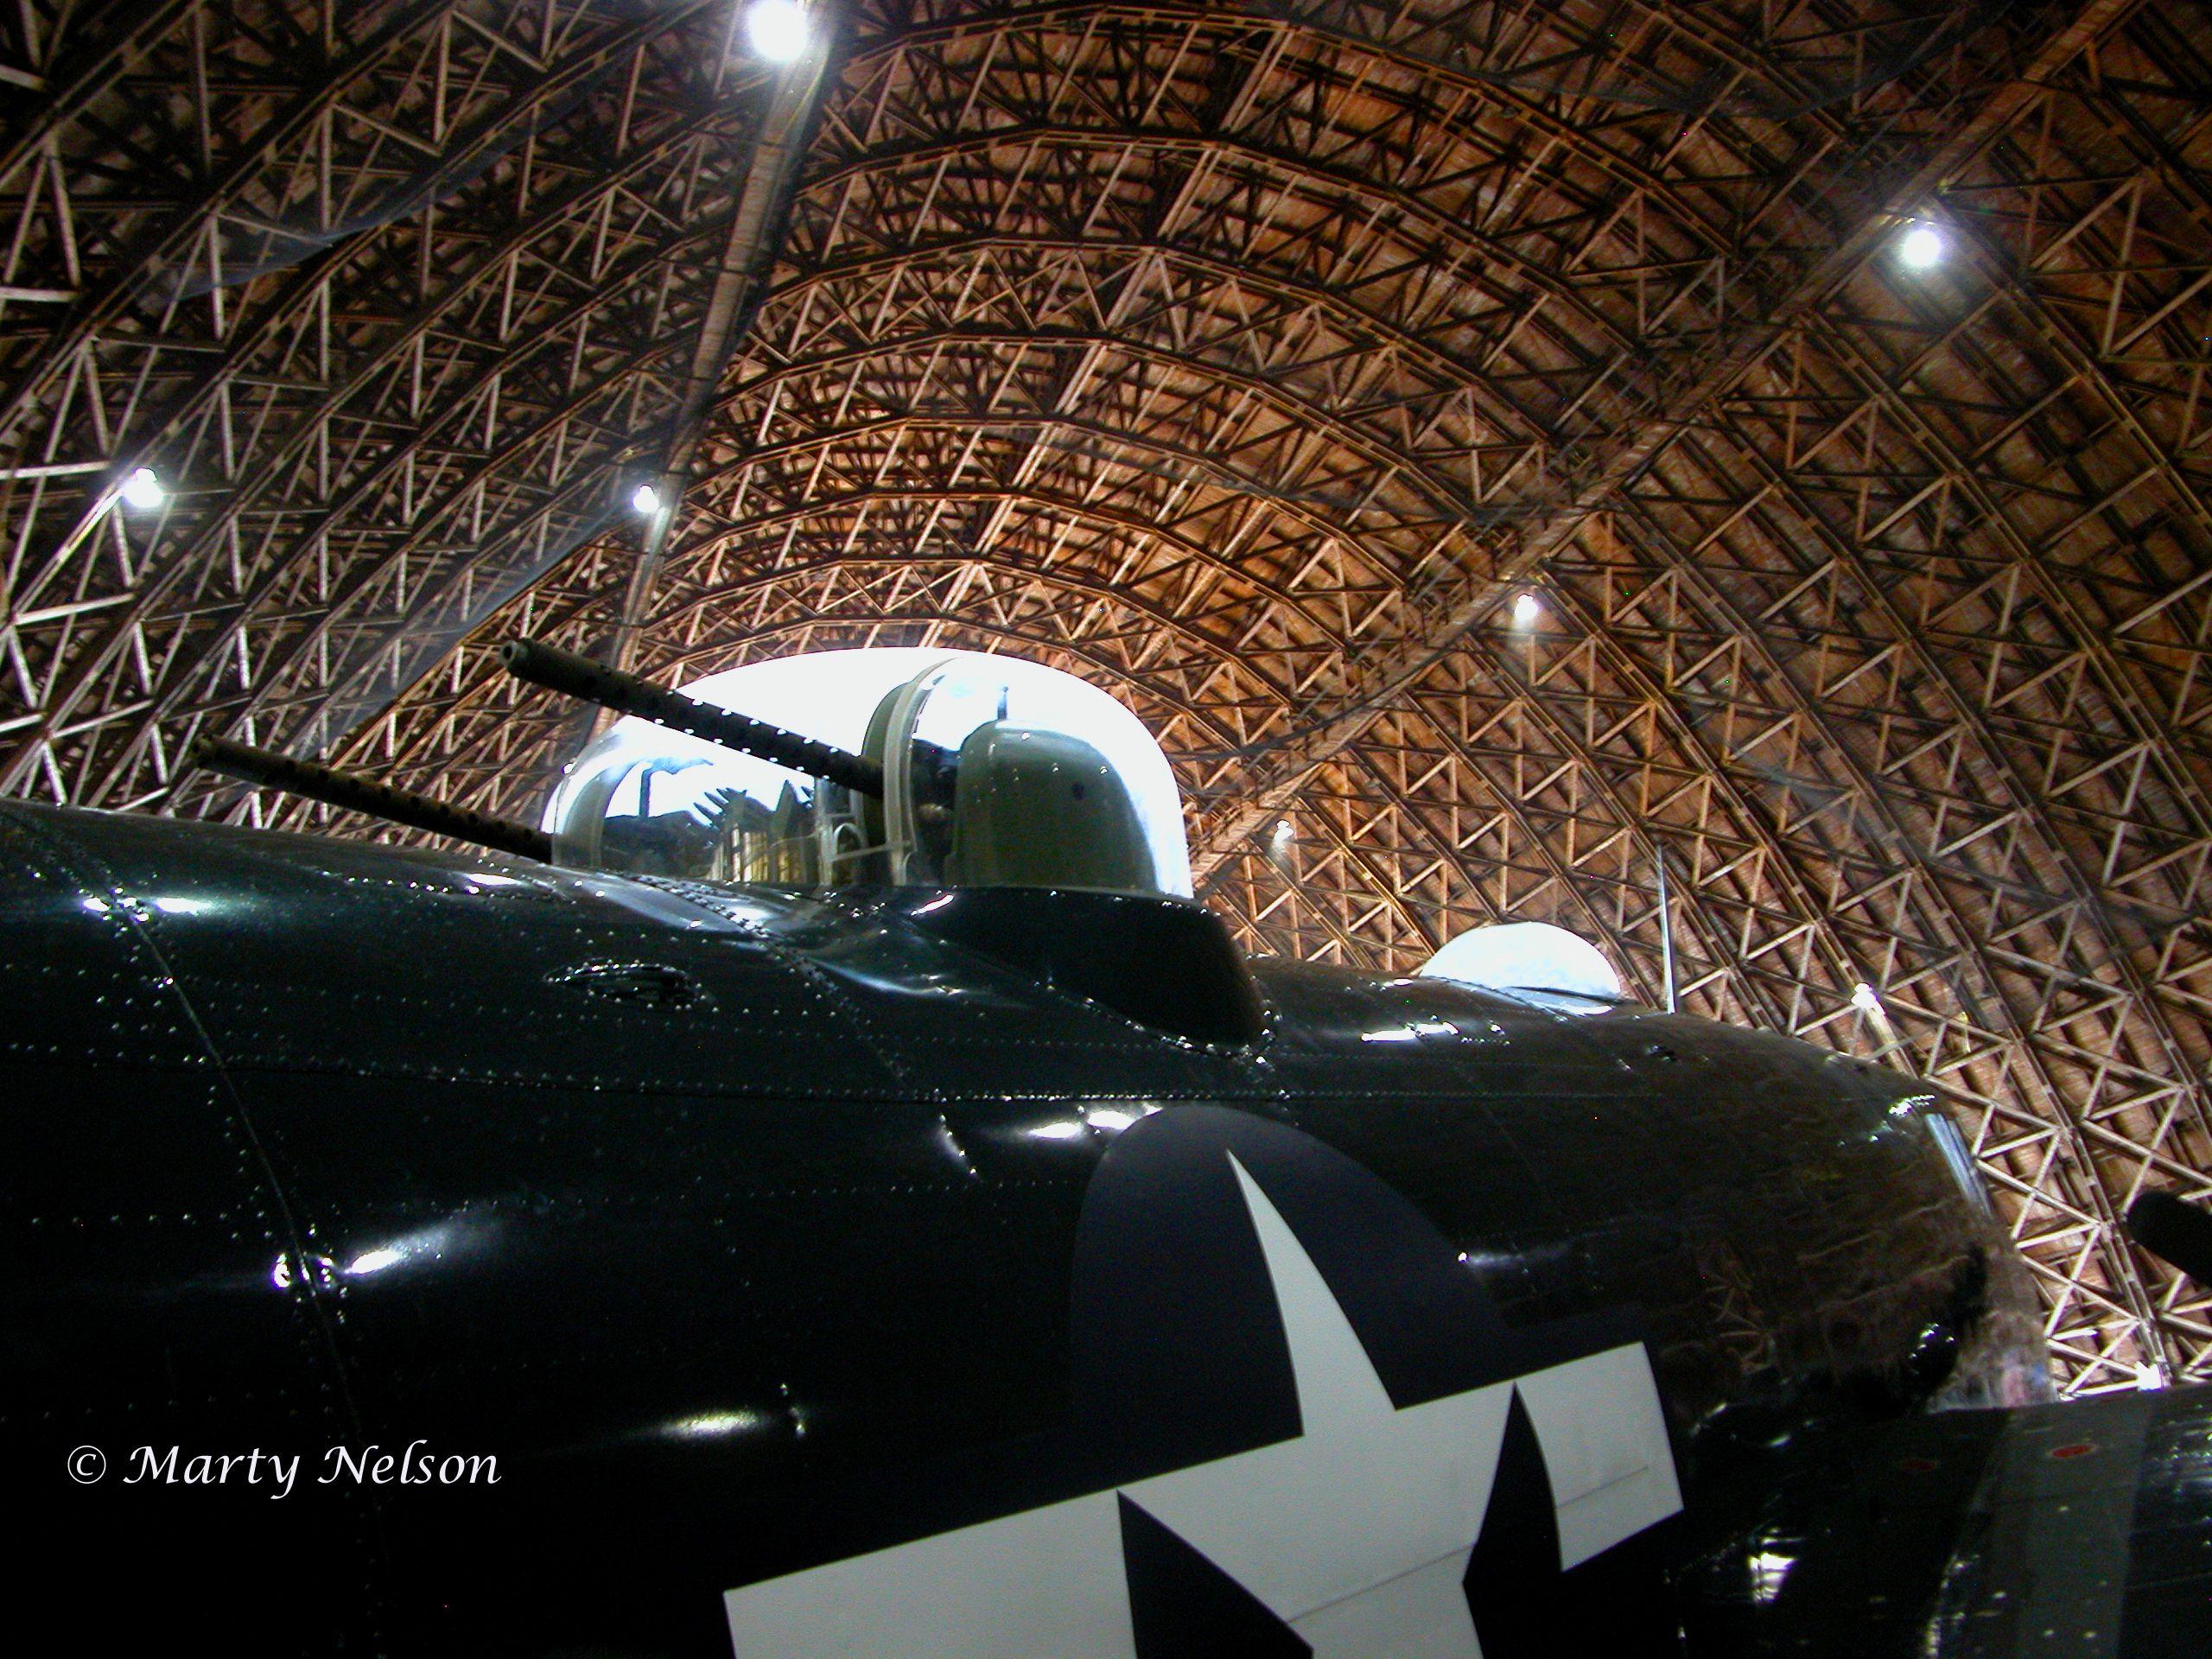 Fighter plane with guns, Tillamook Air Museum, Oregon. NOT